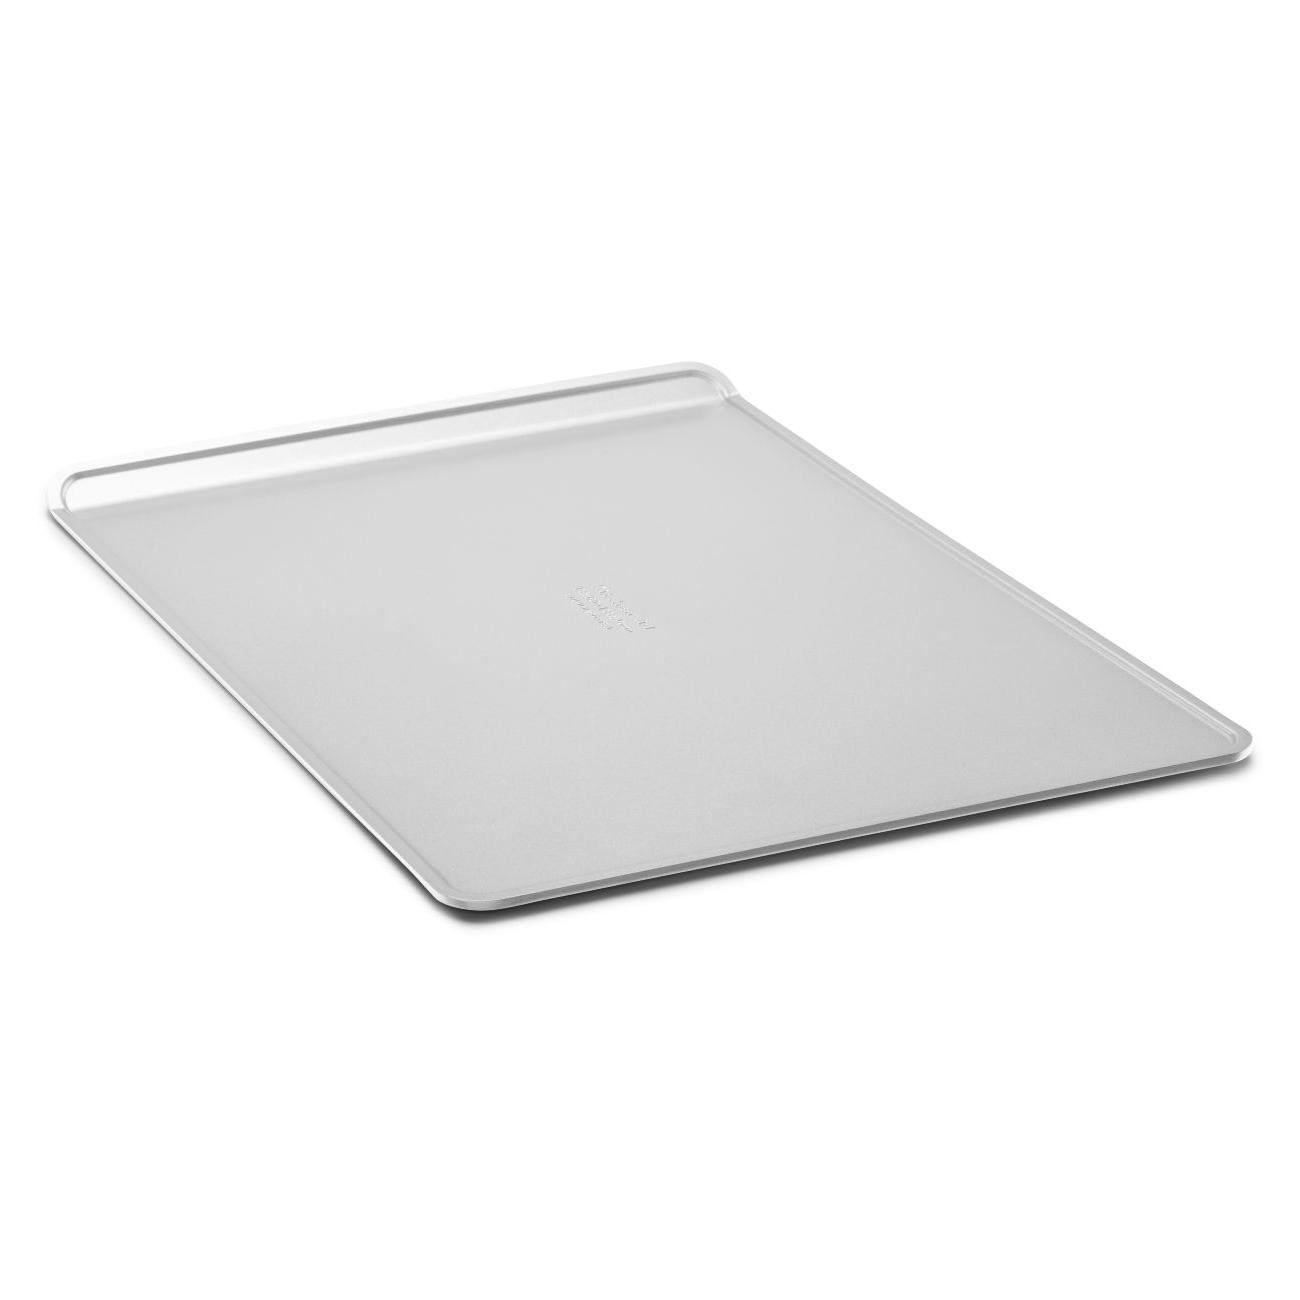 KitchenAid Nonstick Aluminized Steel 13 x 18 Inch Large Cookie Sheet